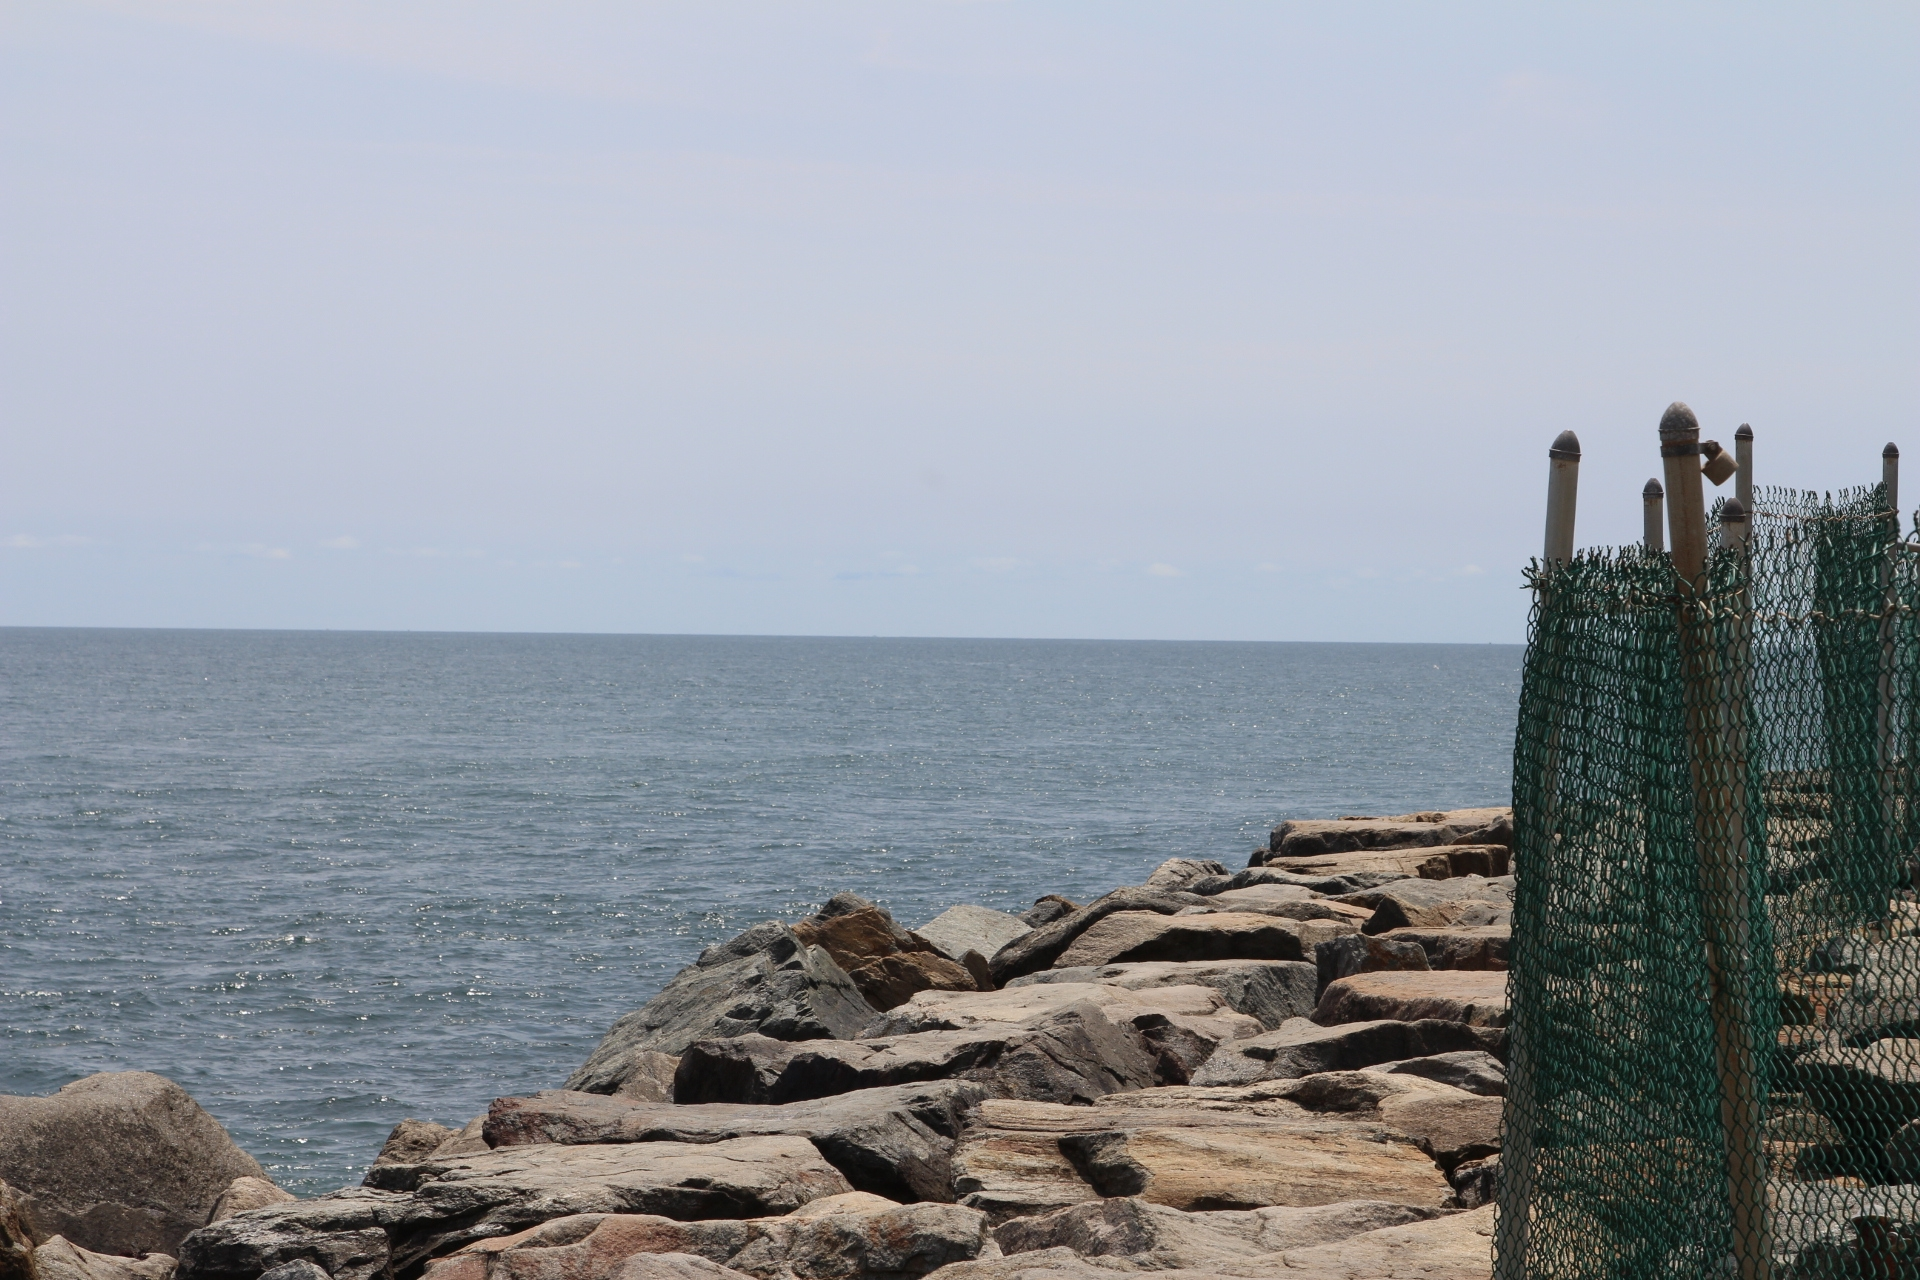 Rocks on shore_3